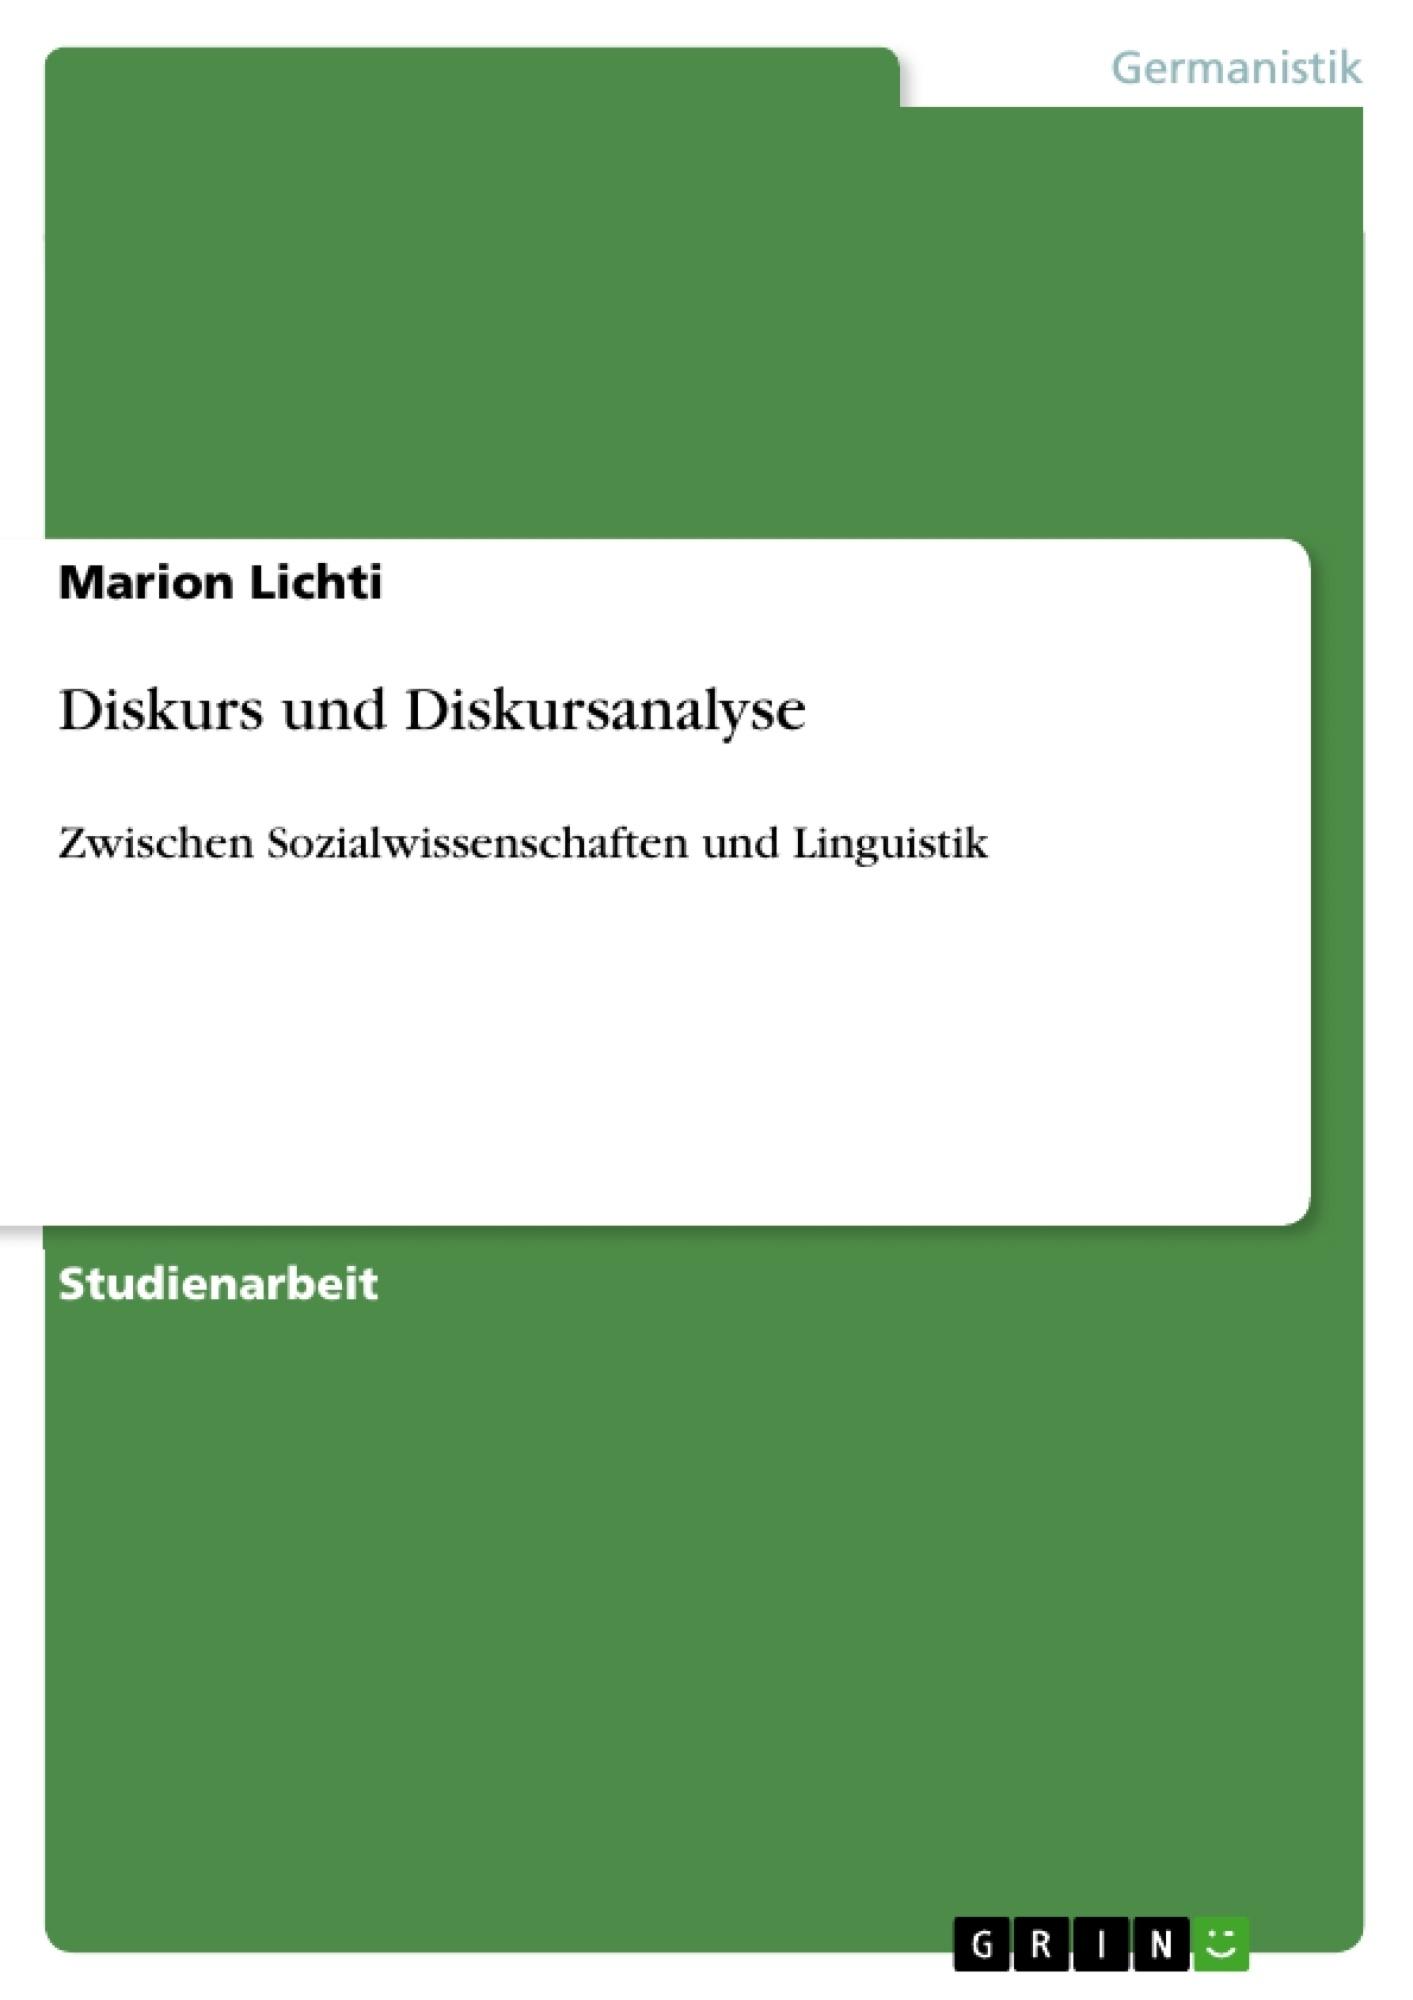 Titel: Diskurs und Diskursanalyse